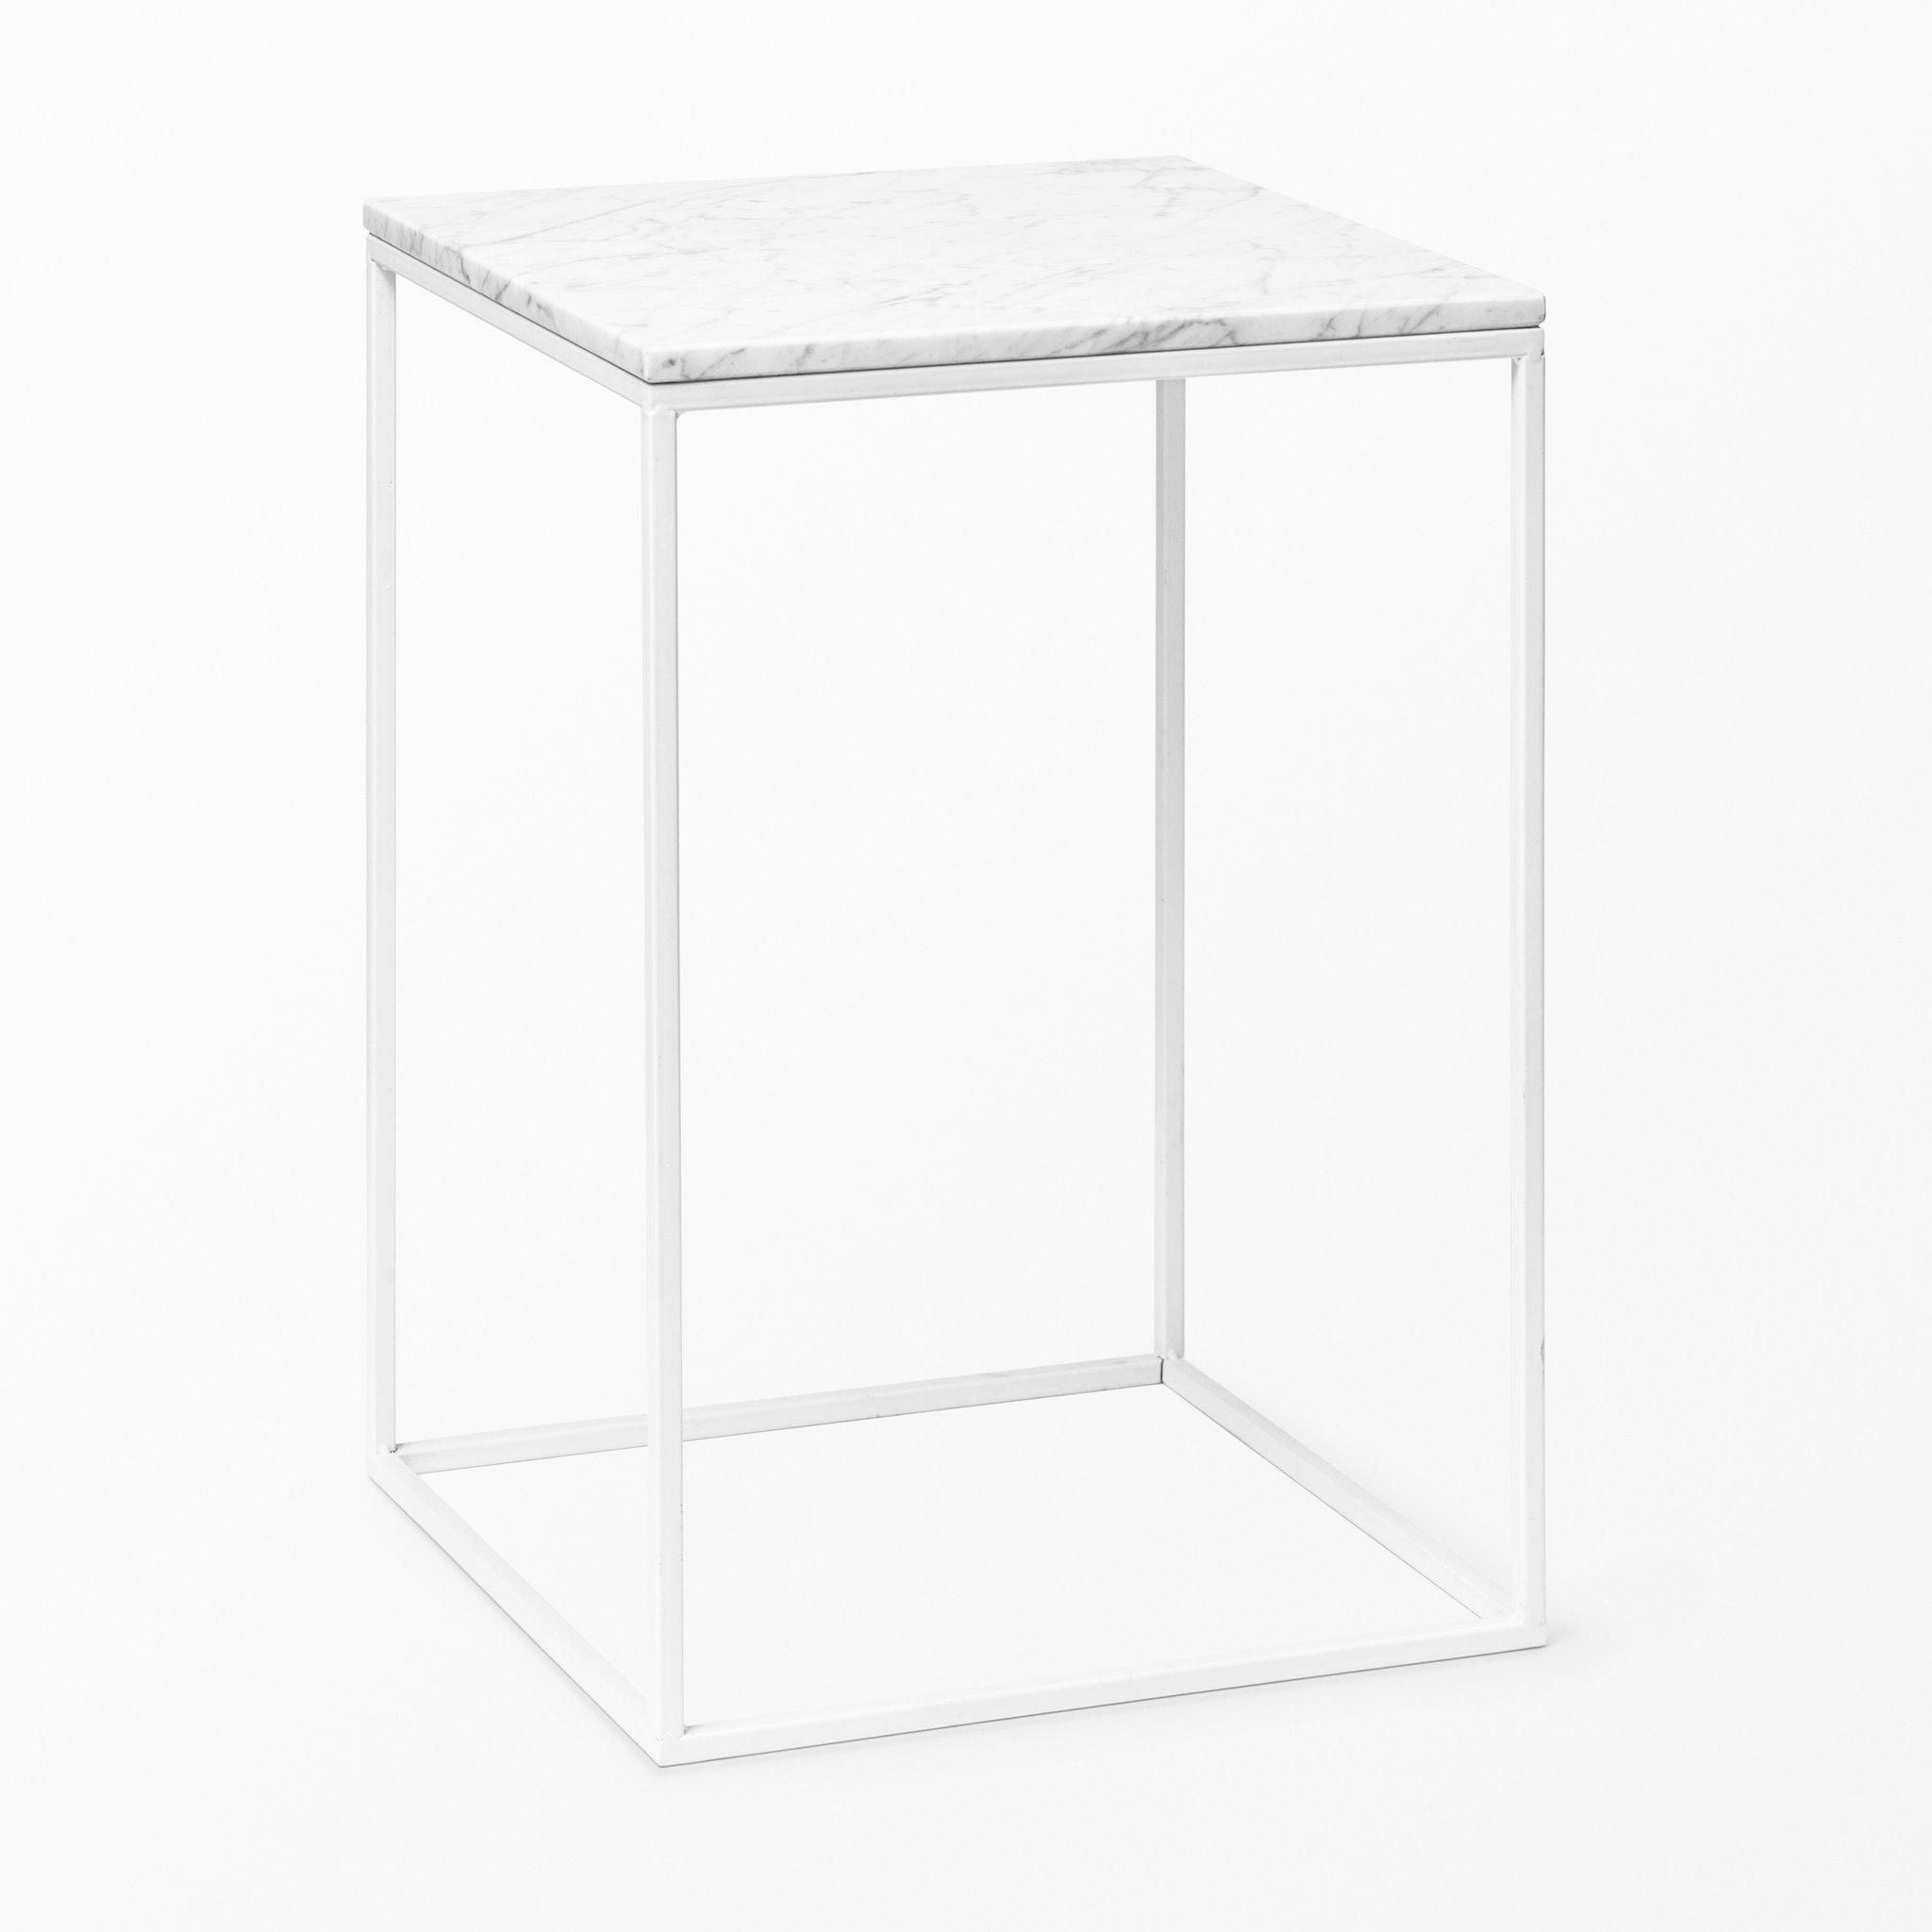 Kända Bord i marmor, 50x35x35 cm - Soffbord - Köp online på åhlens.se! RY-45